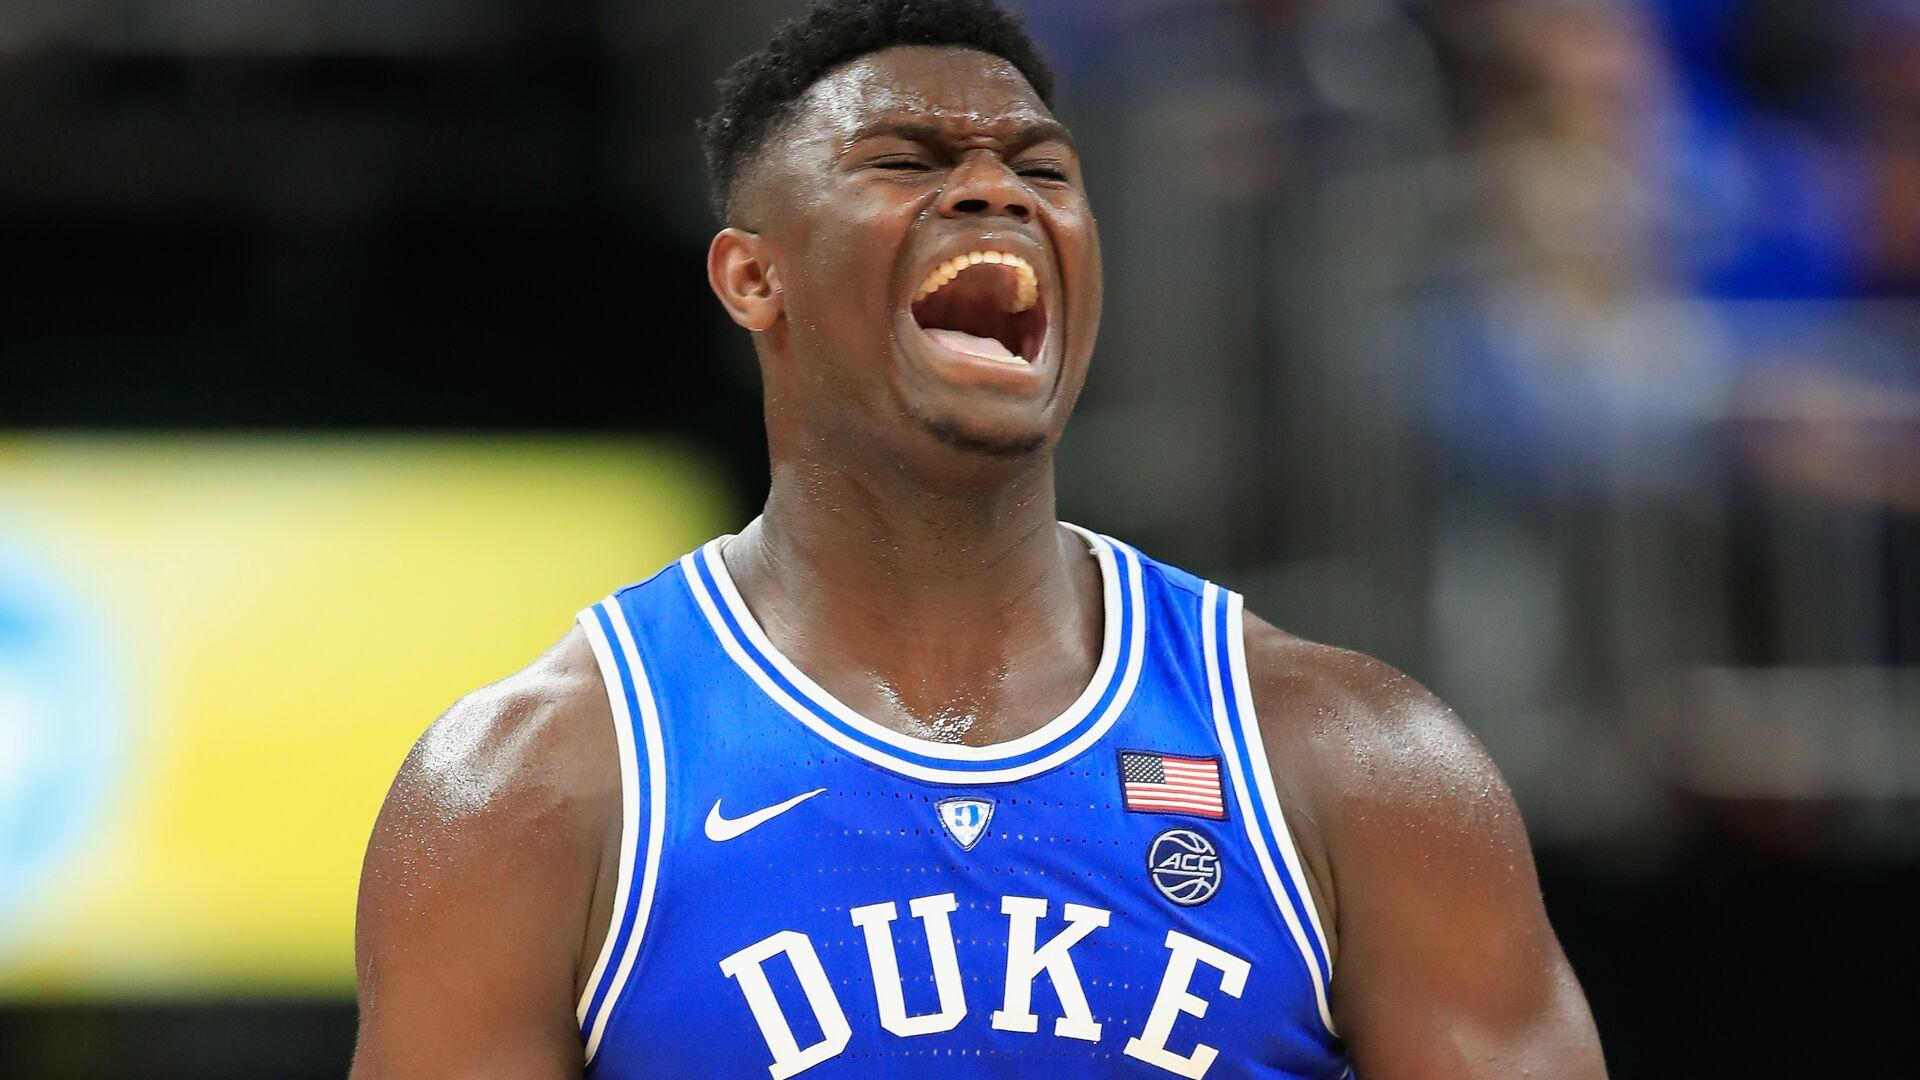 Duke basketball alums in NBA suddenly rival Kentucky crop